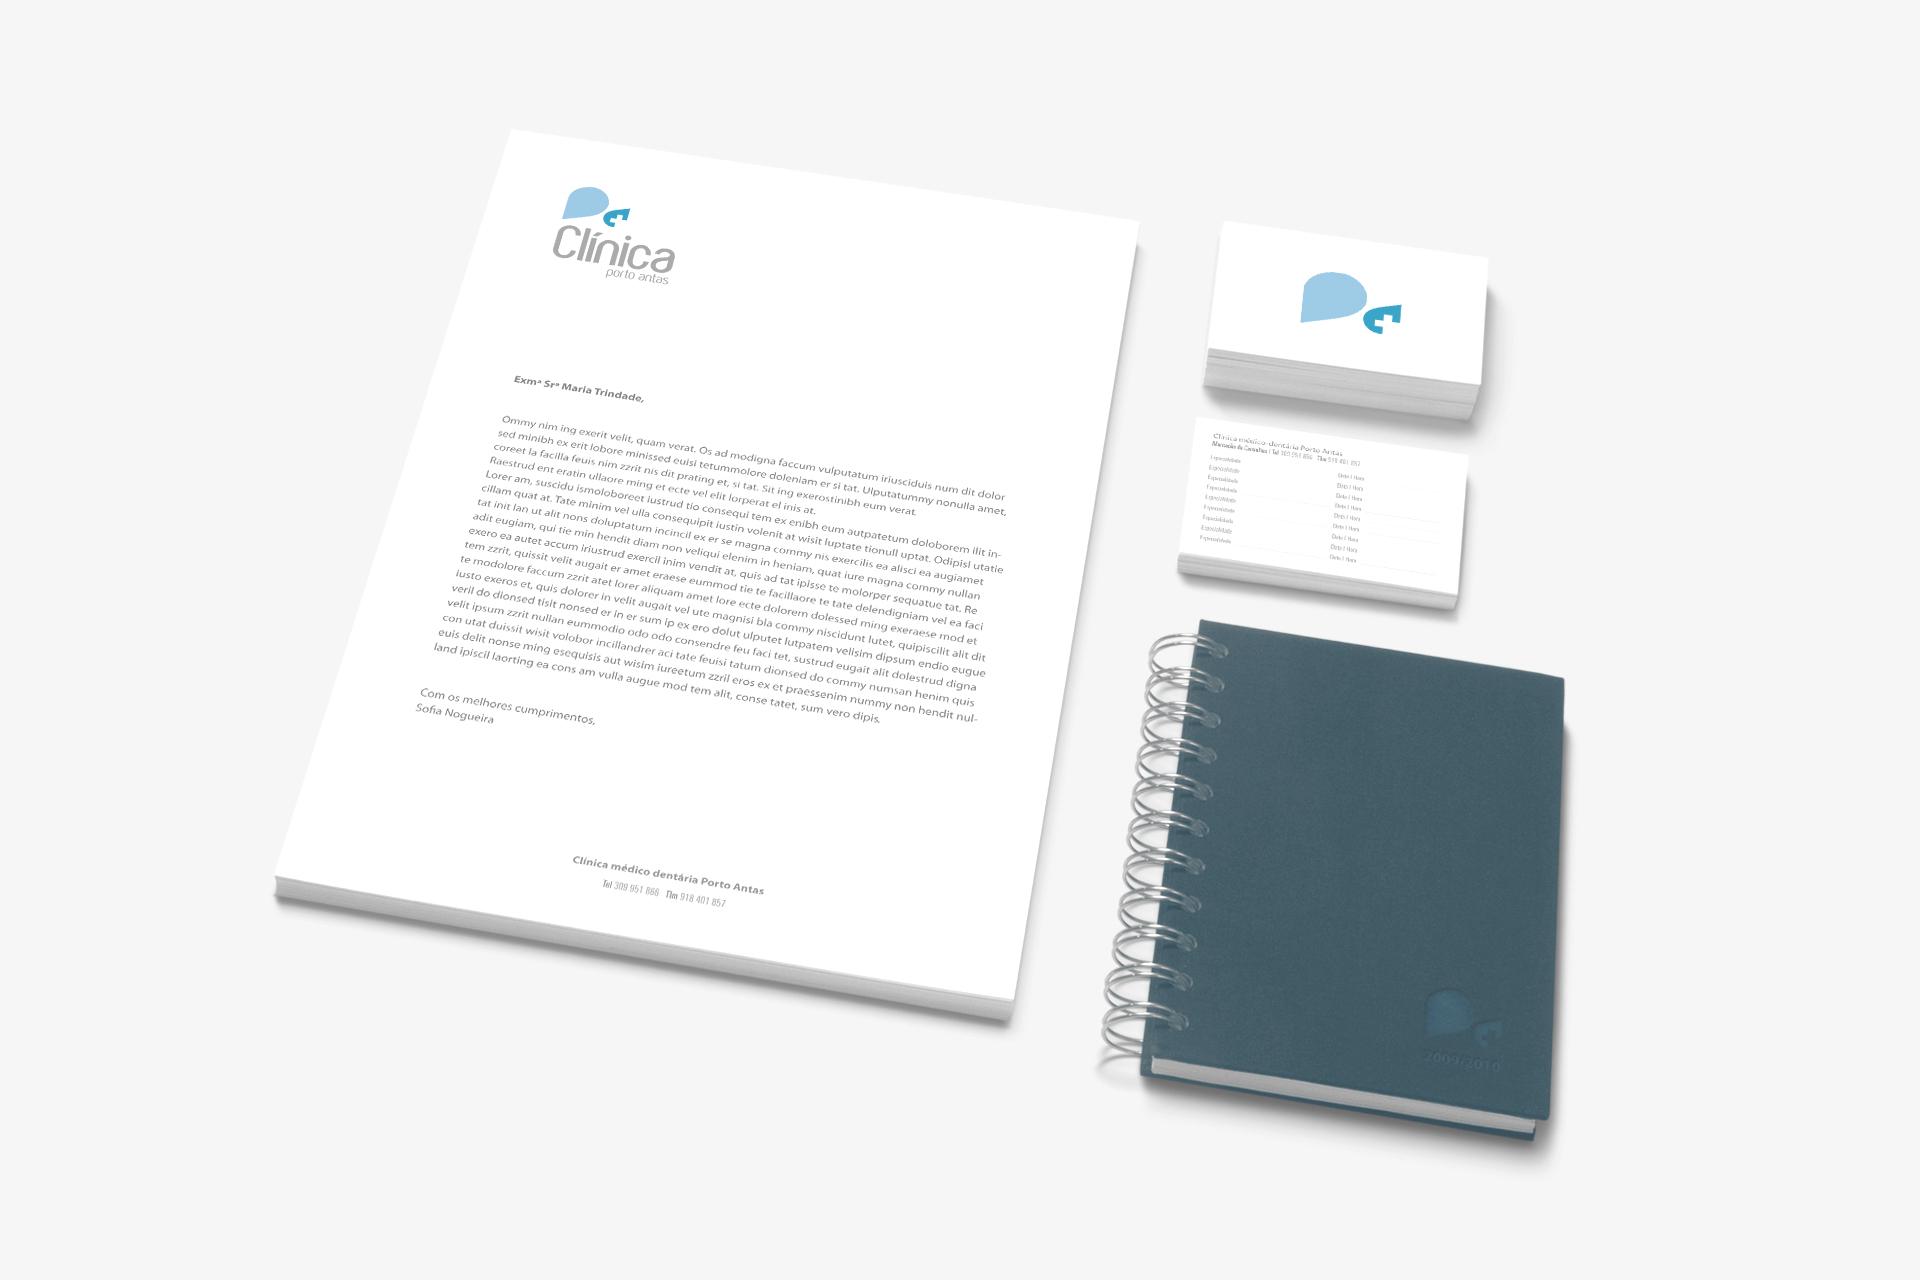 002_ClinicaPortoAntas_branding-2.jpg